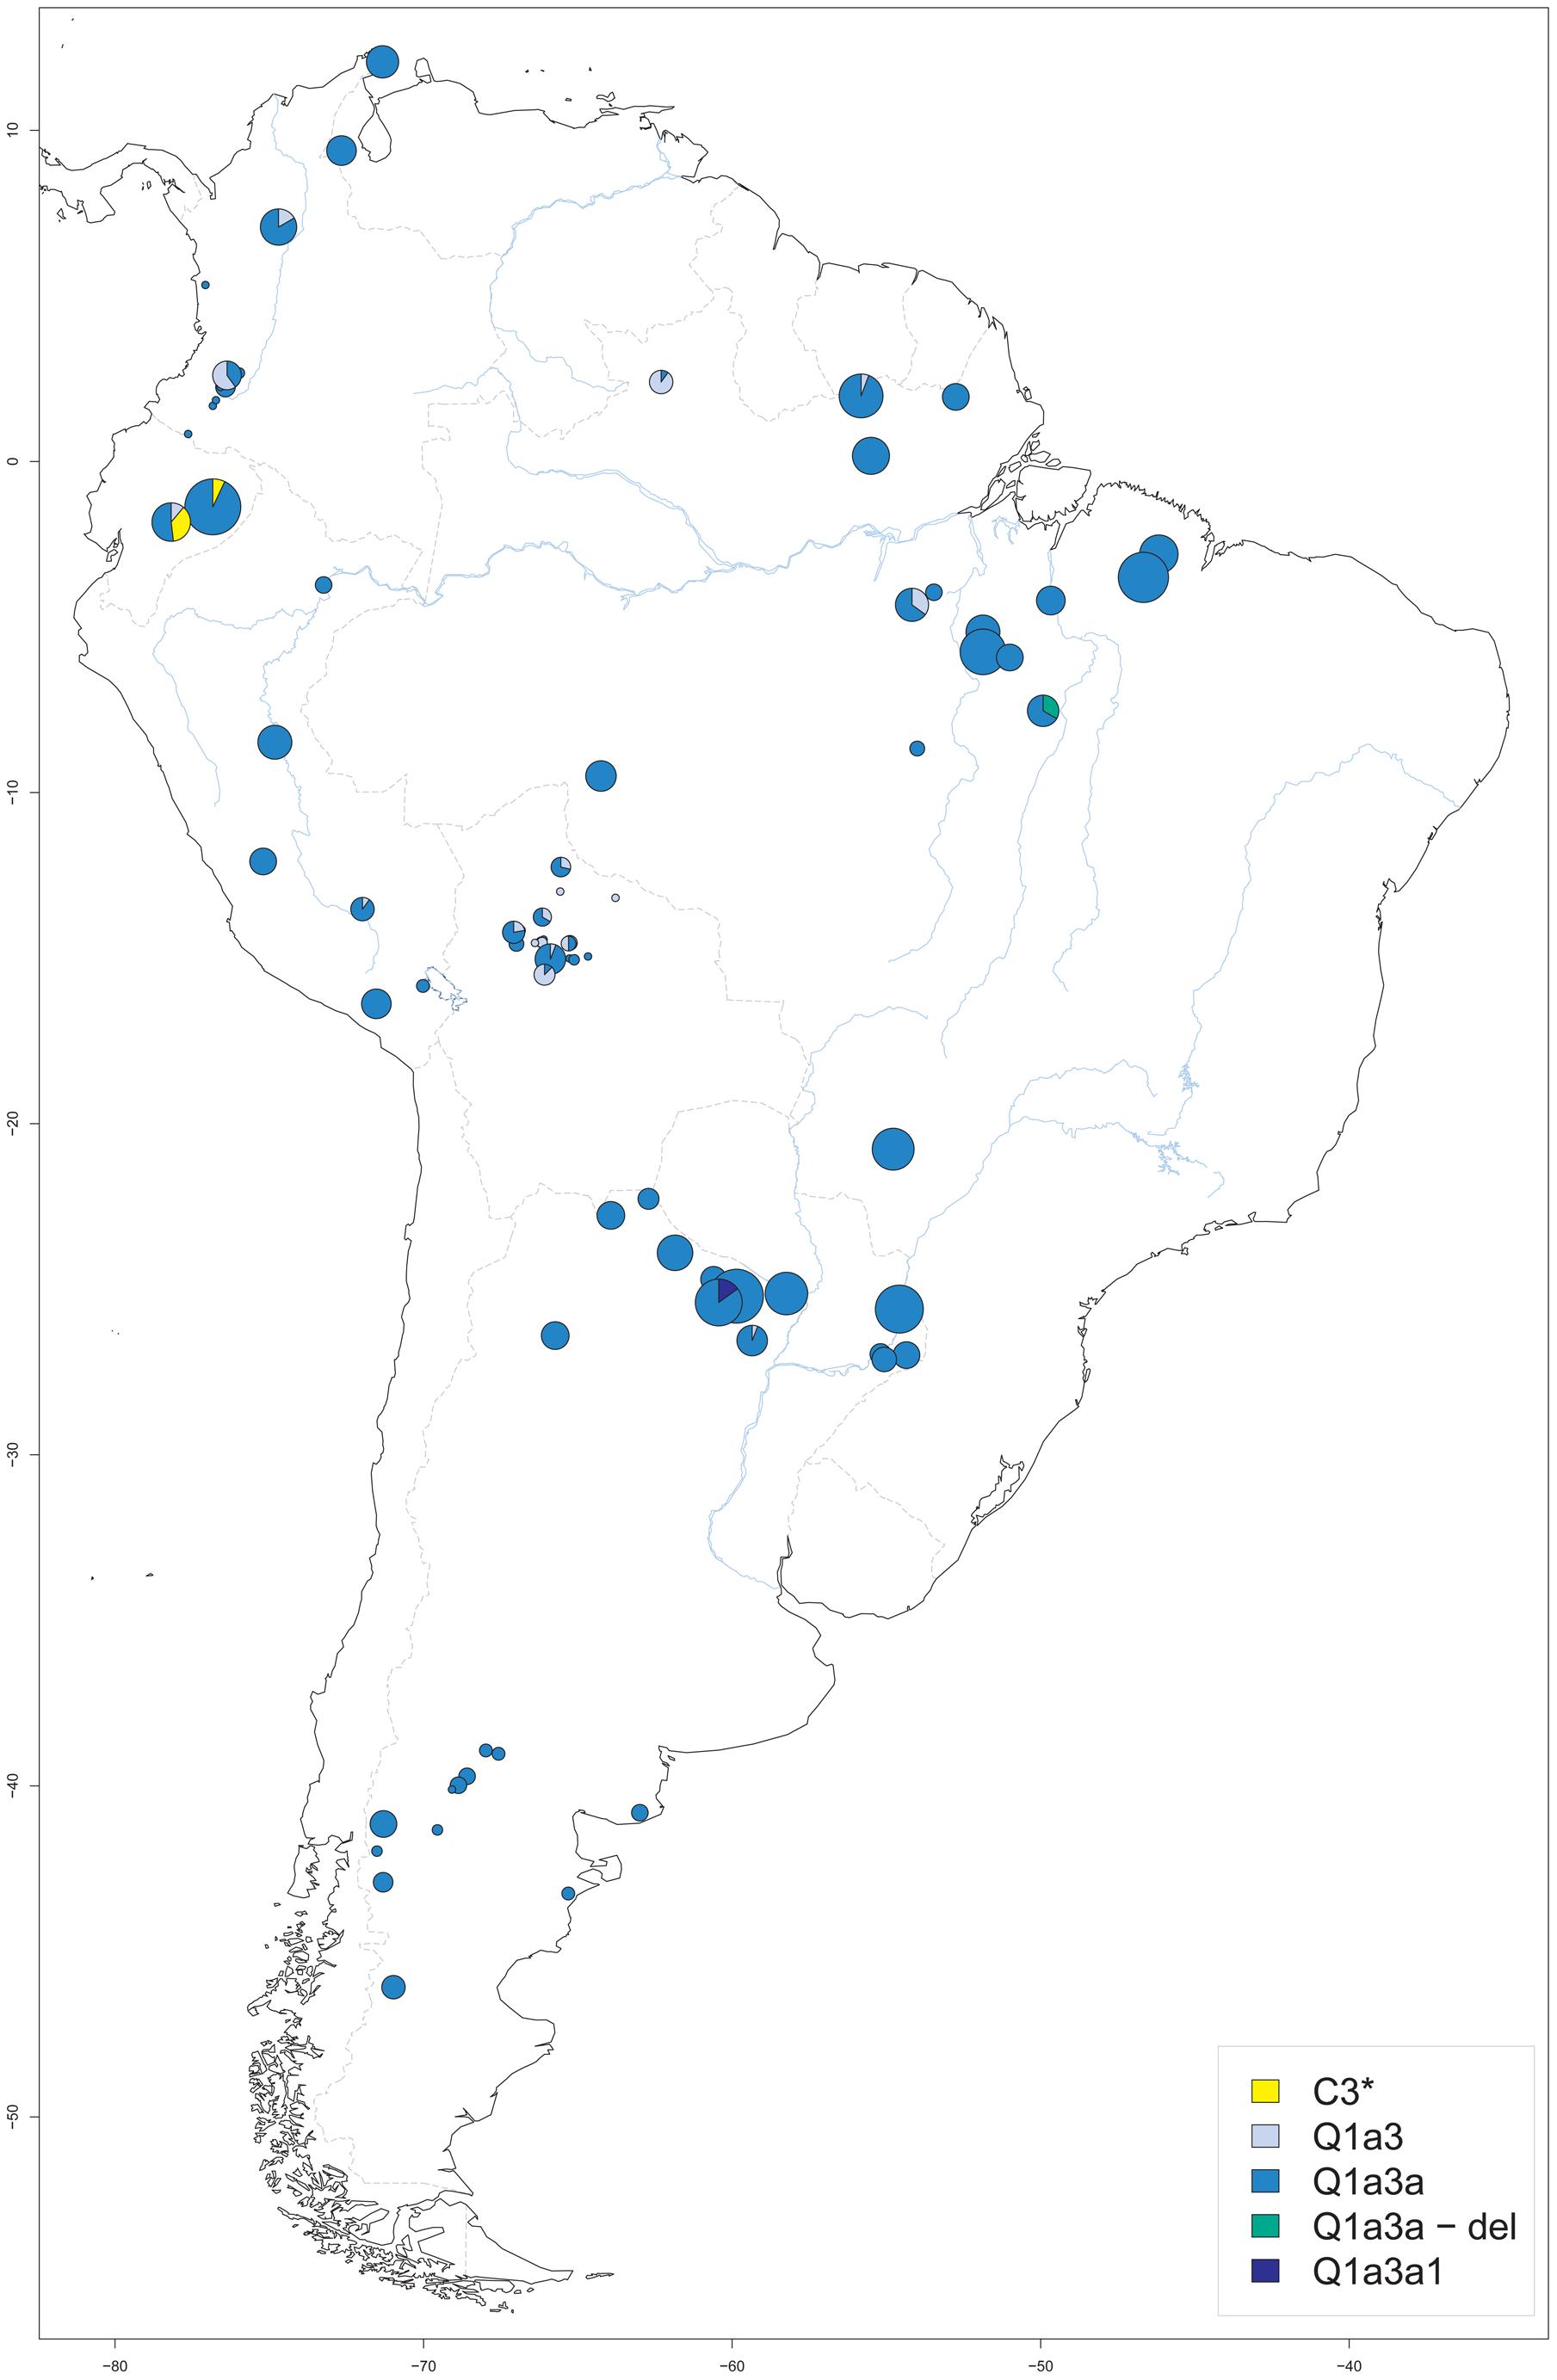 Origin of male native South American samples.